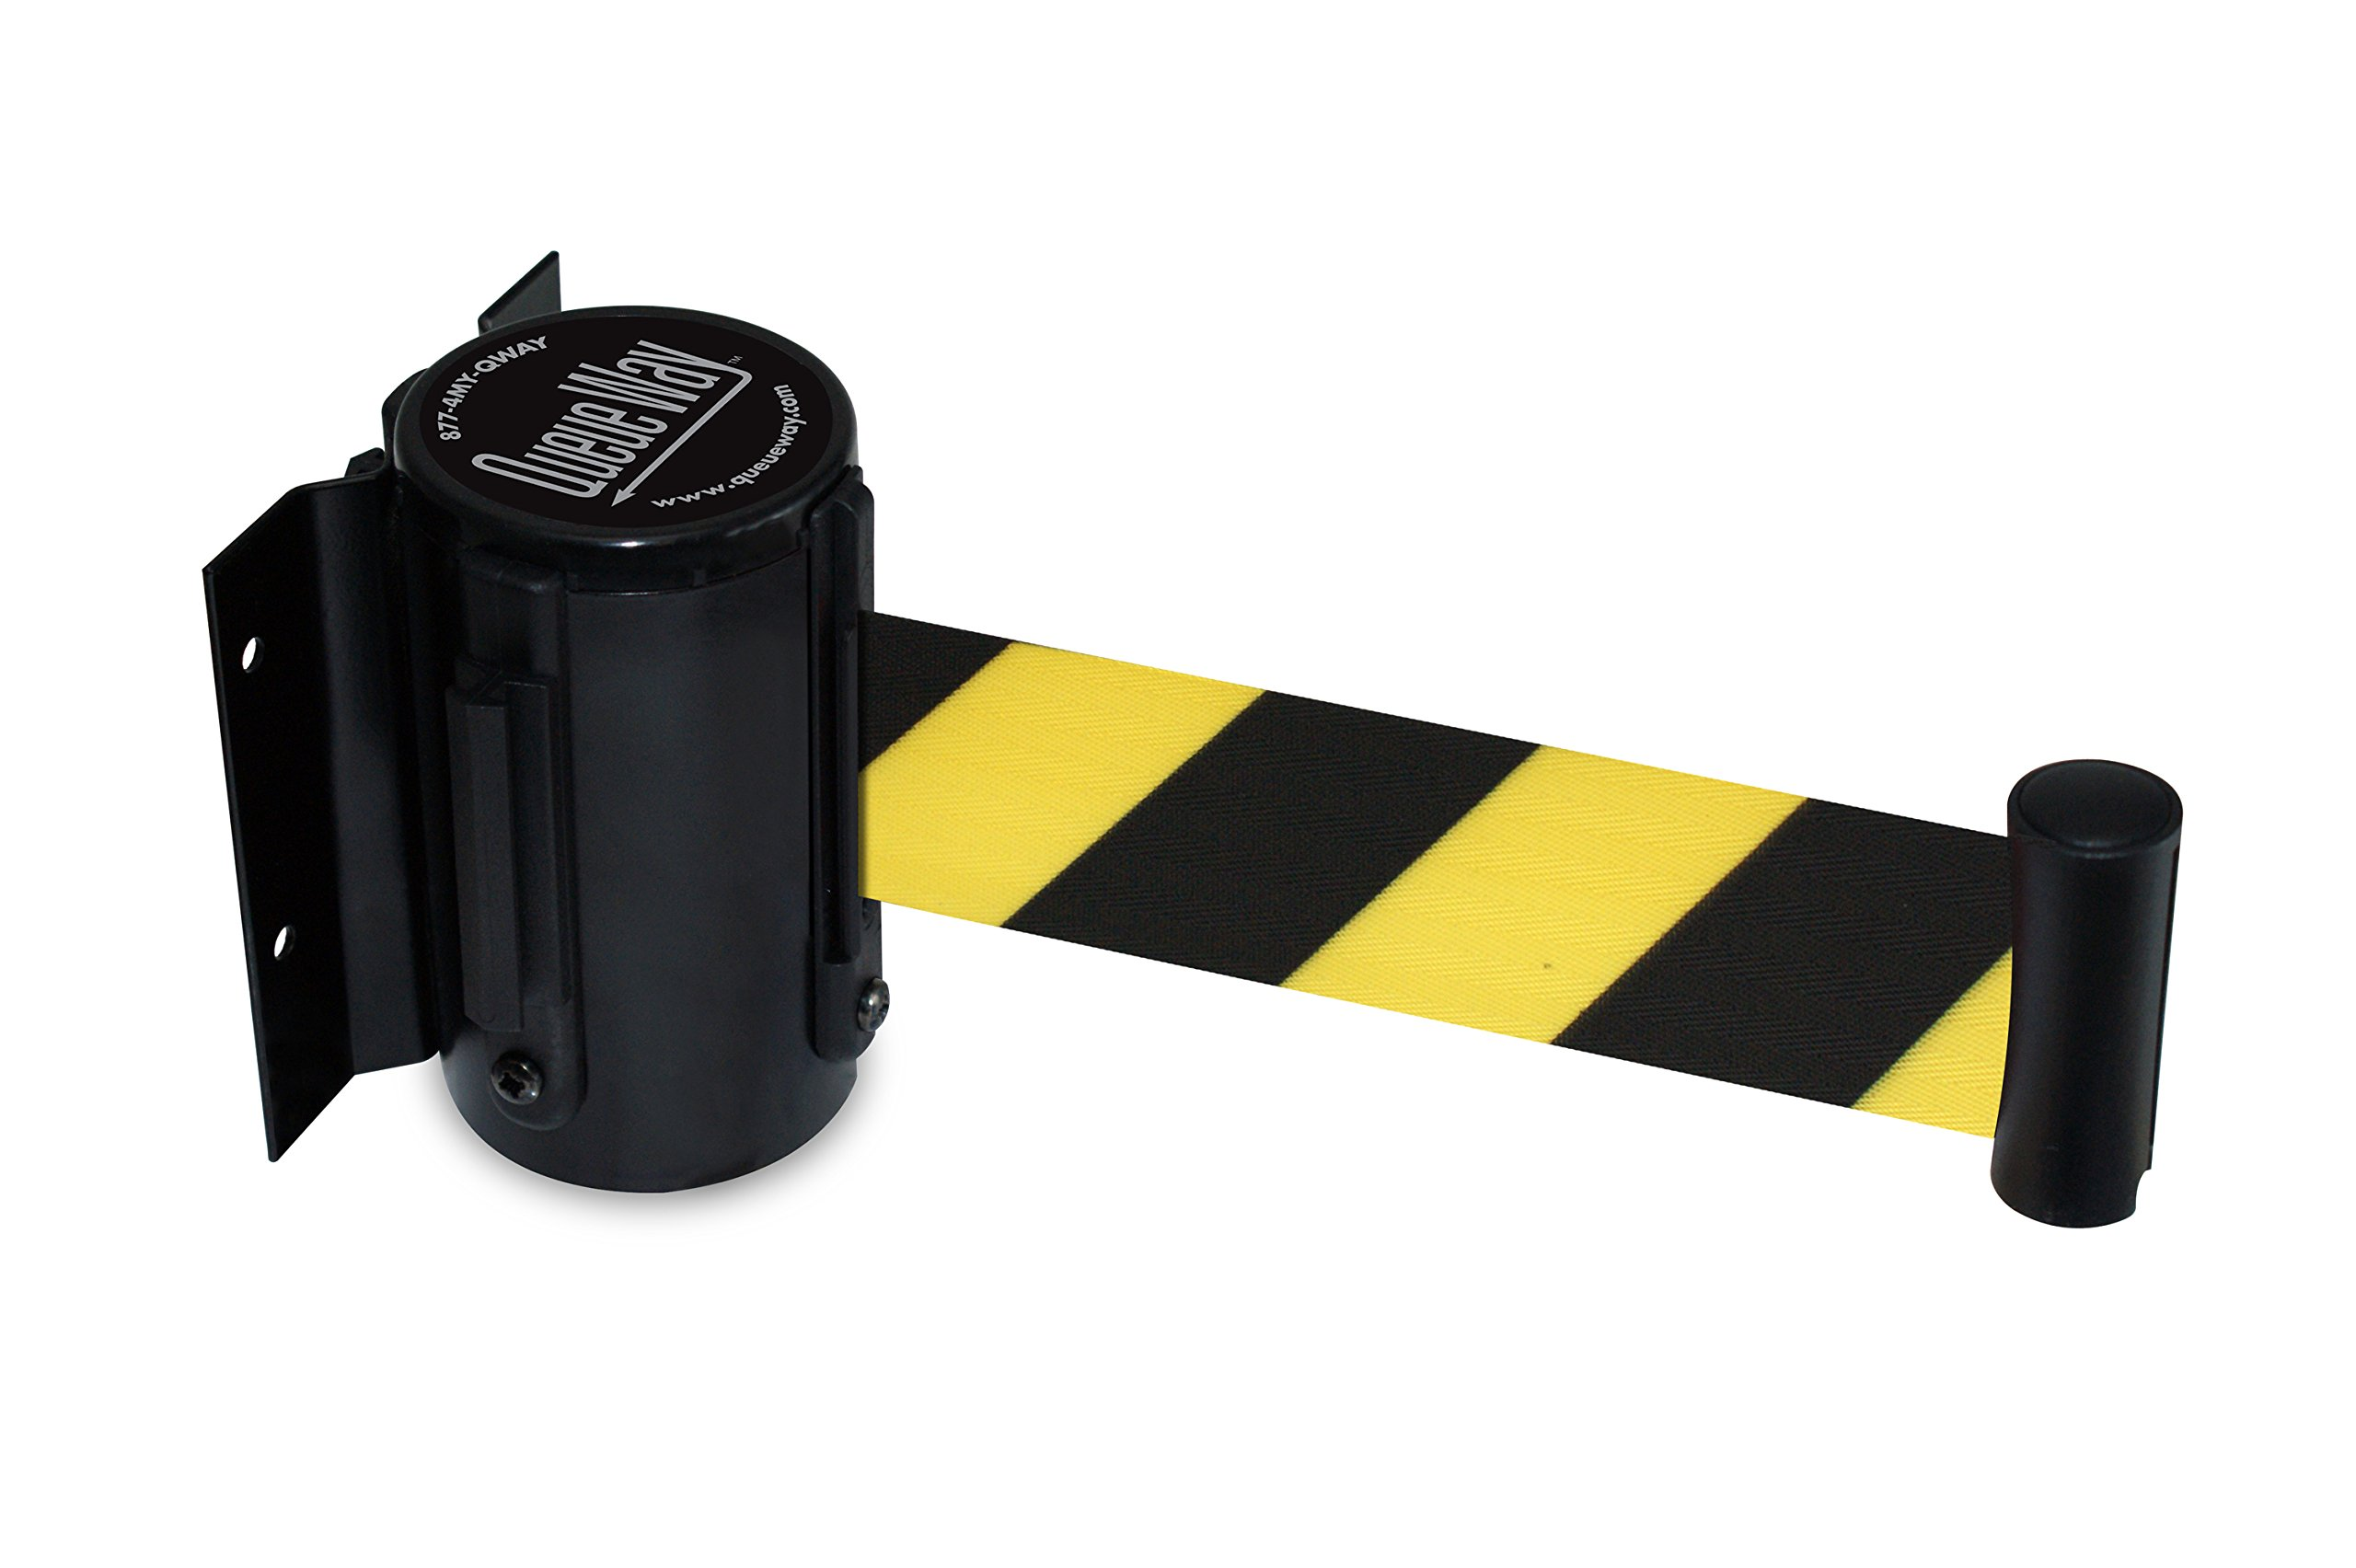 Tensator QWAYWALL-D4 QwayWall Wall Mounted, Black Finish, Black/Yellow Diagonal Stripe, 7'6'' Belt by Tensator